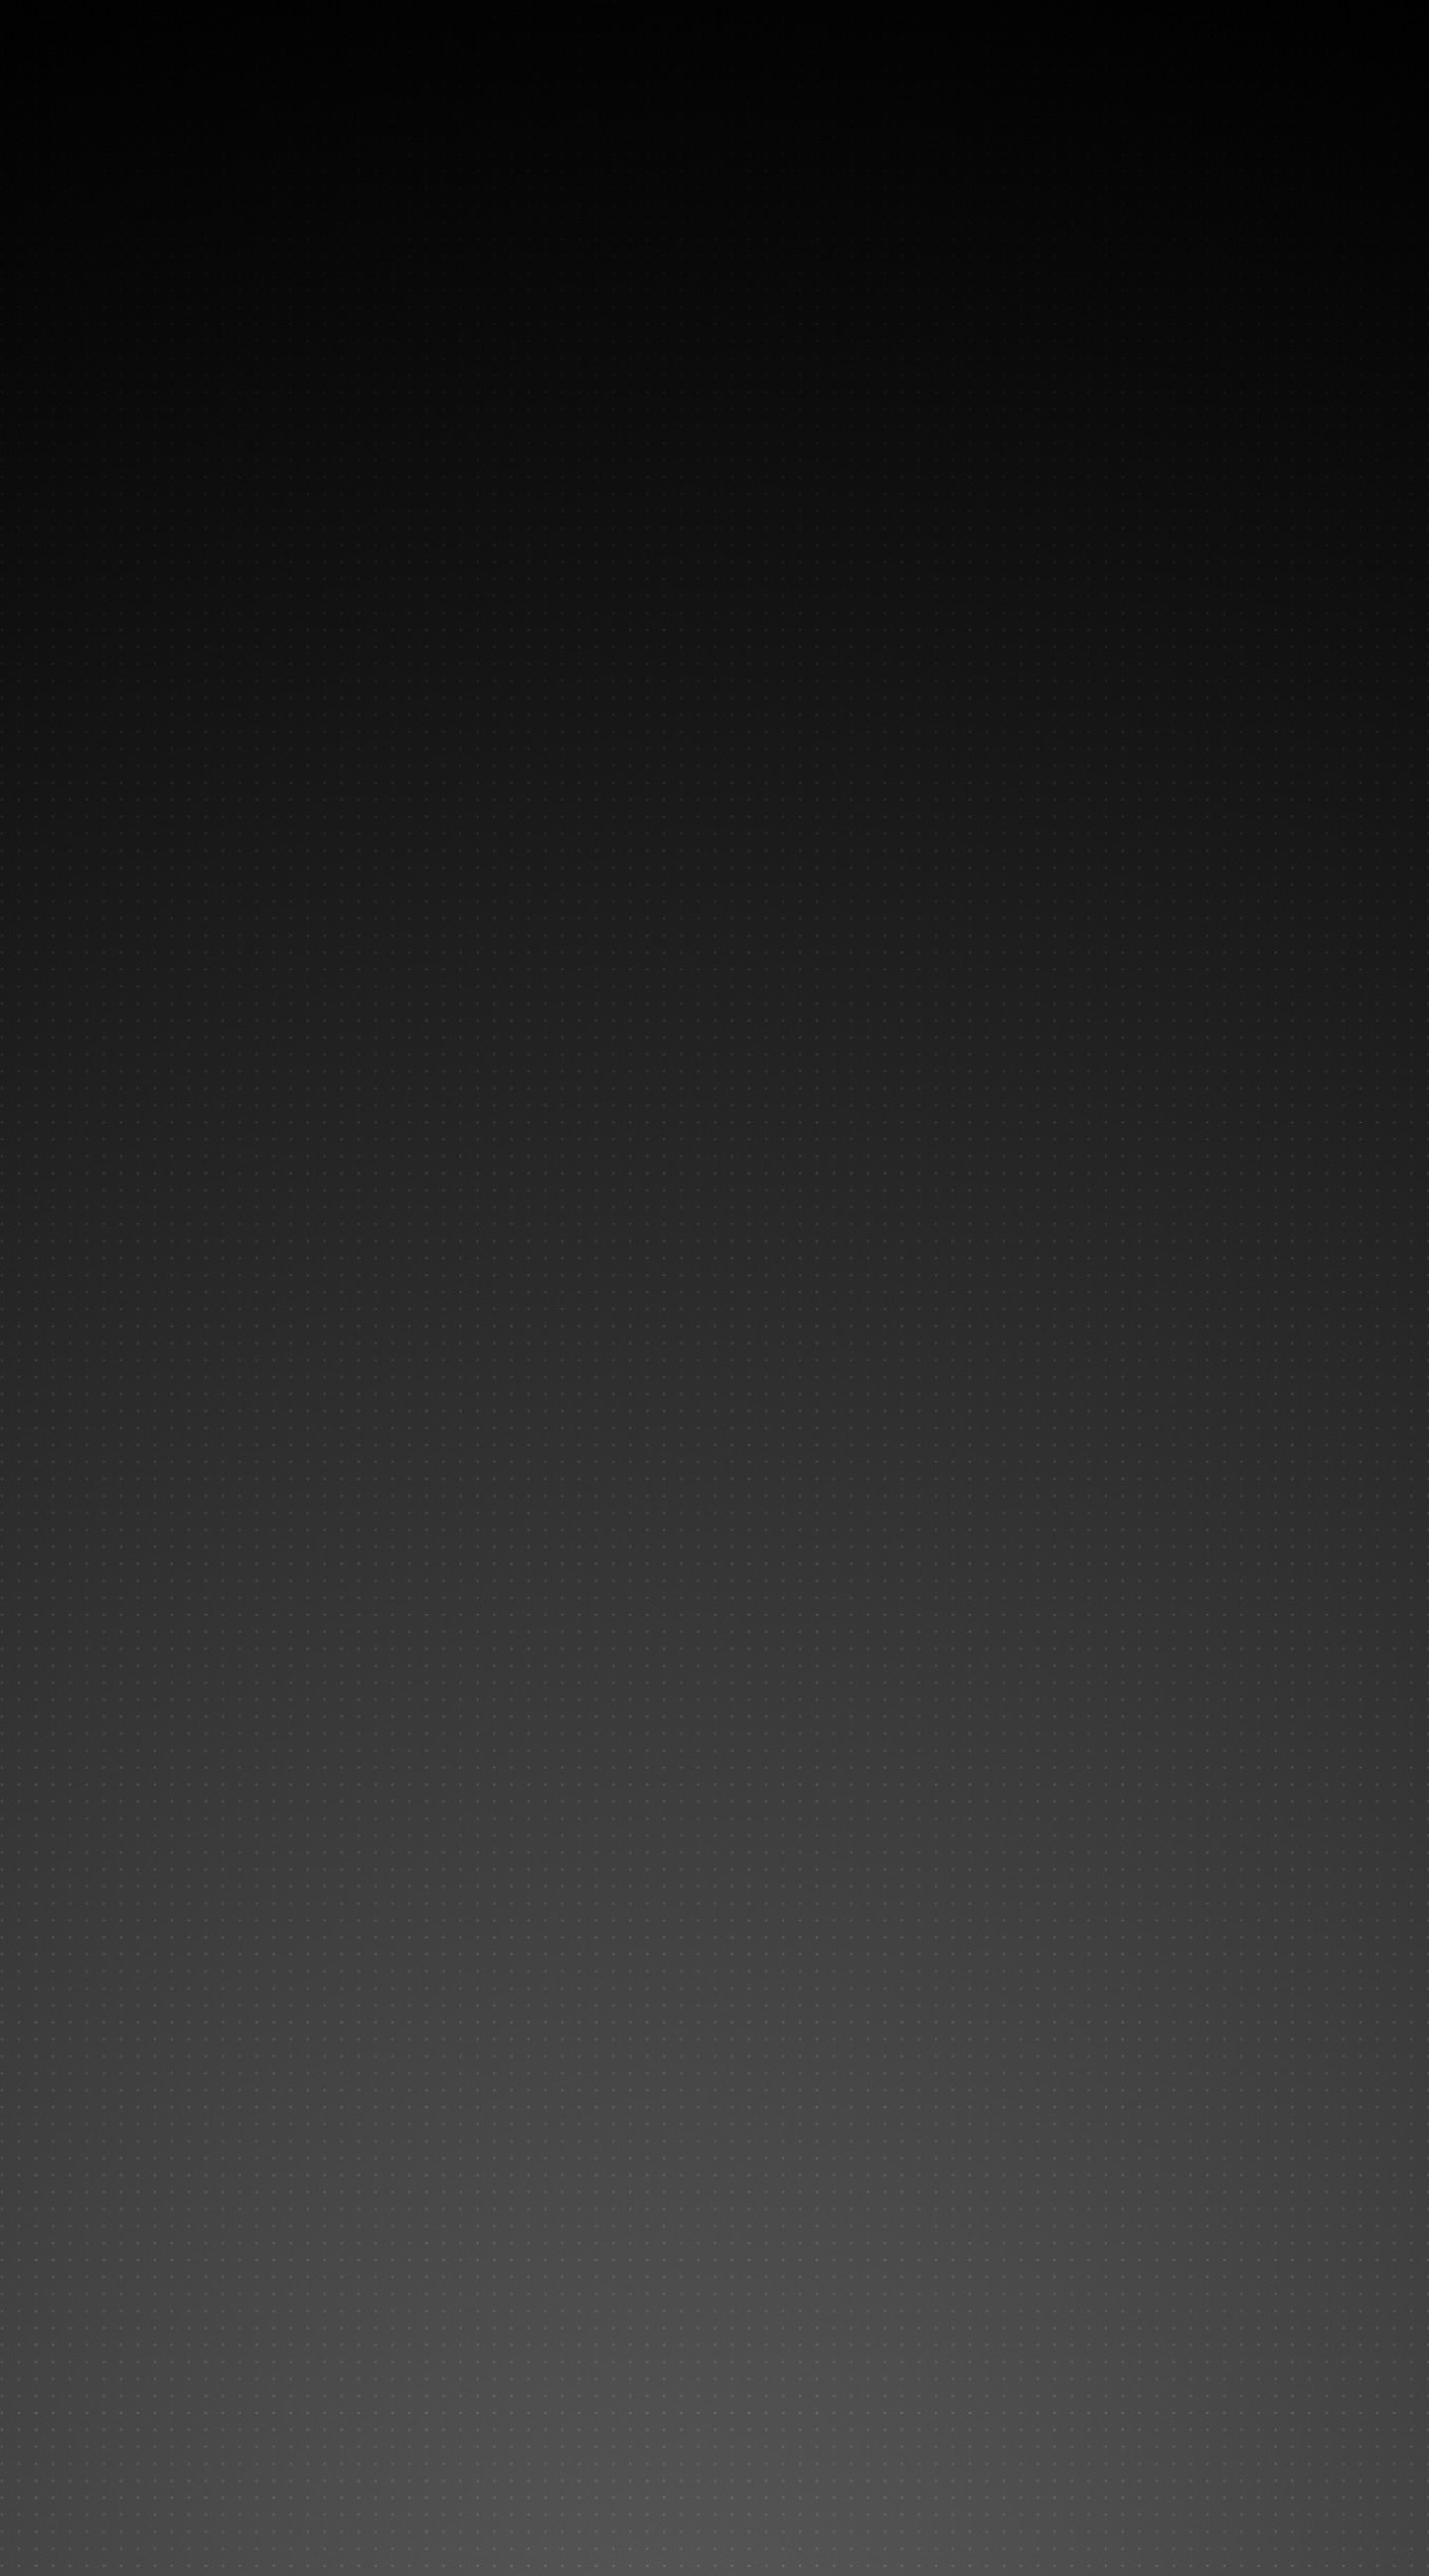 1920x1080 Apple Carbon-Design Dario999 HD desktop wallpaper : High .